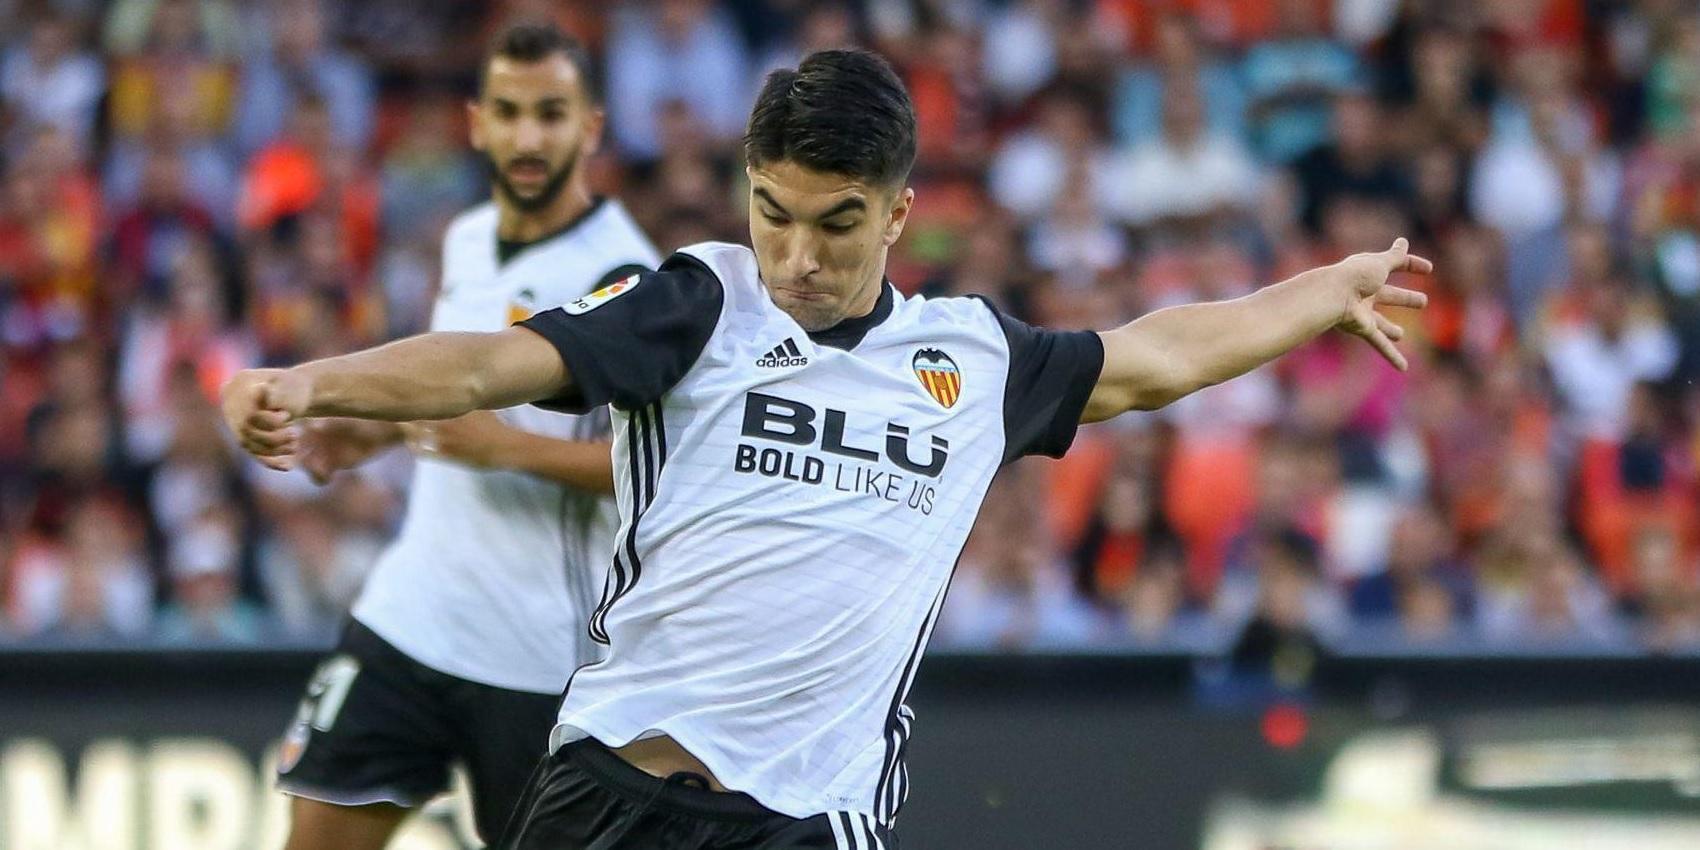 Liverpool target versatile Valencia midfielder ahead of potential January move – report